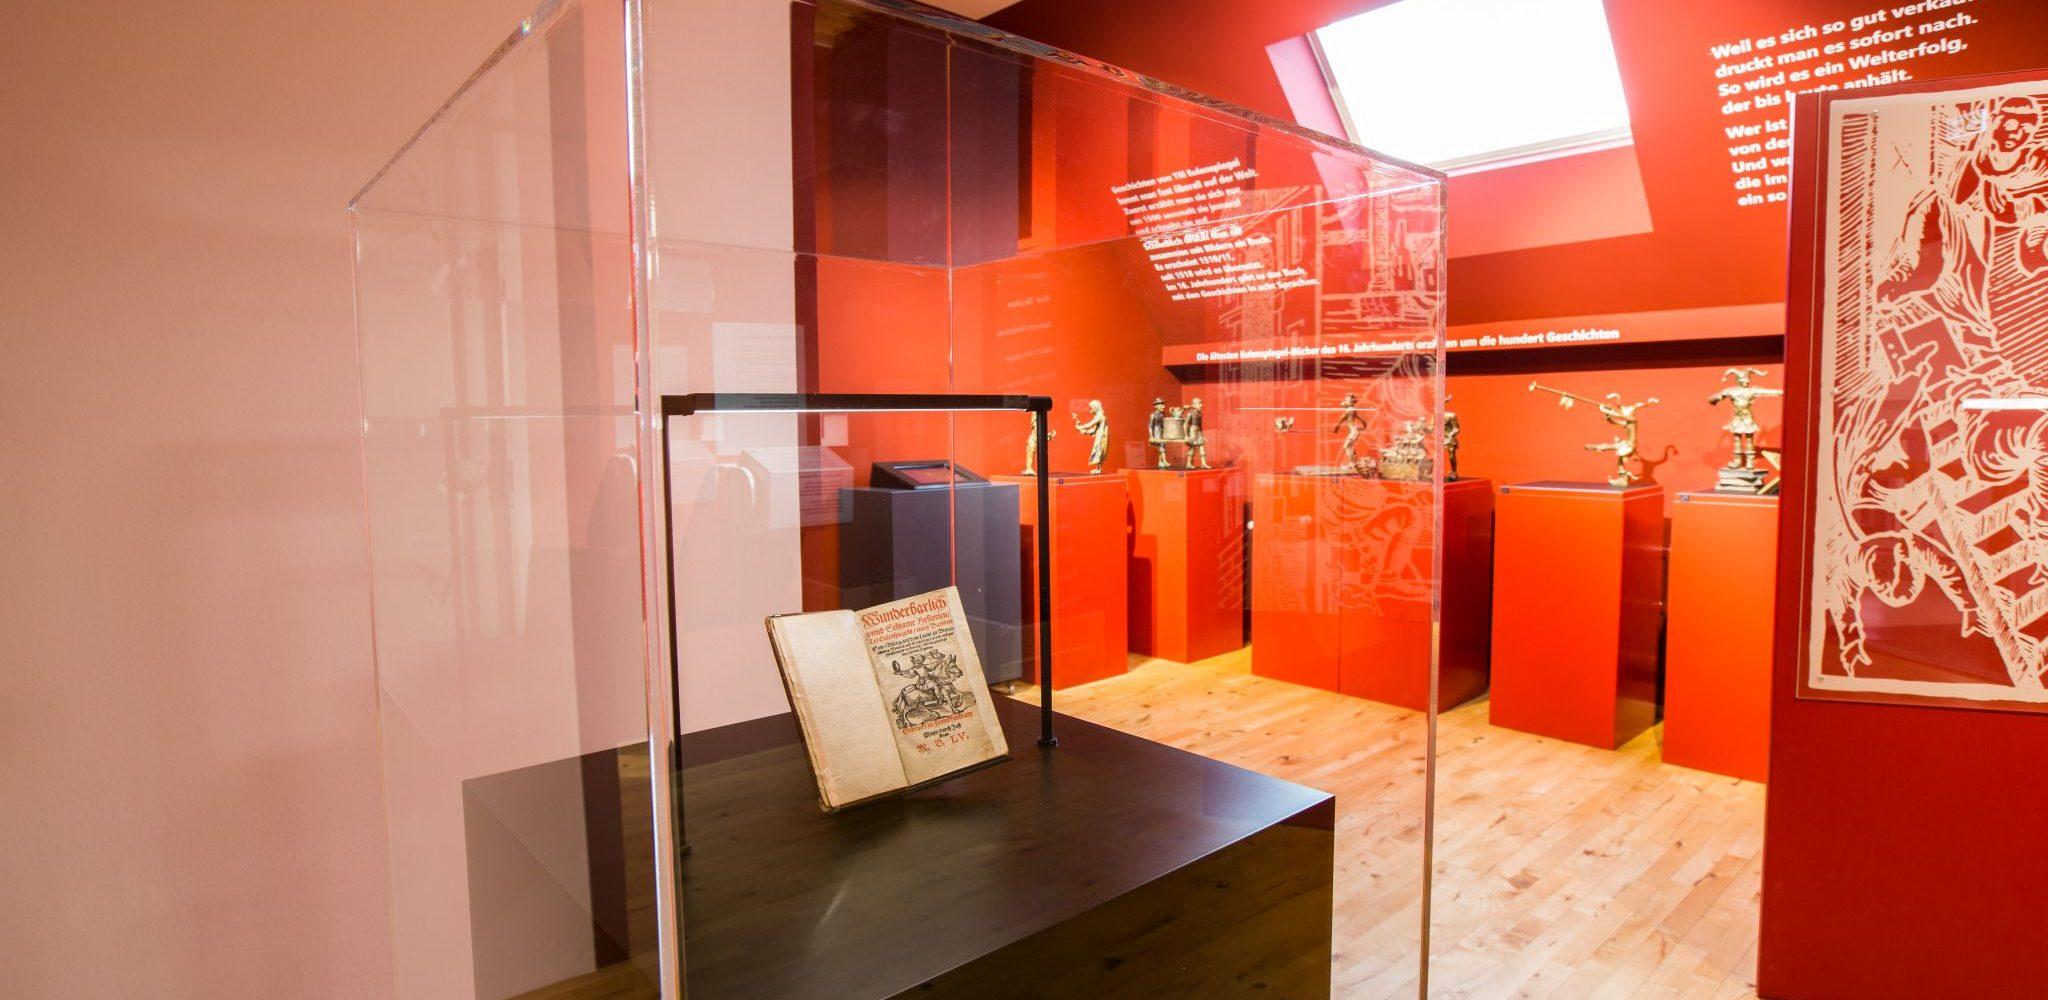 eulenspiegel_museum_(072)